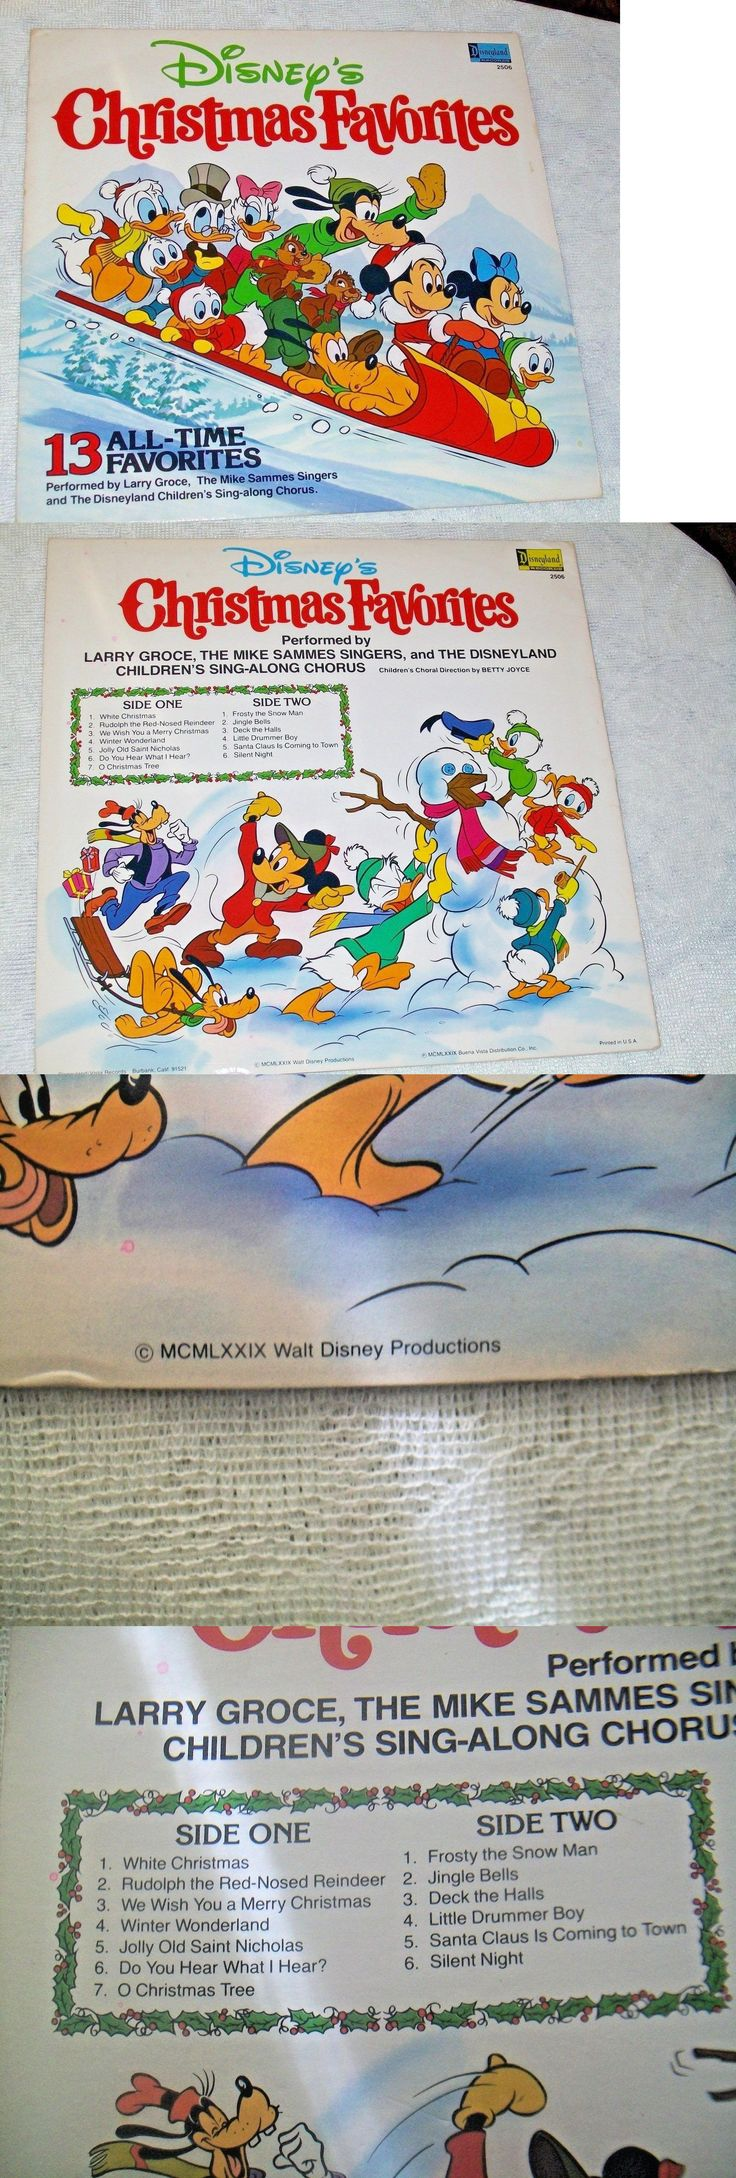 Christmas Songs And Album: 1979 Disneys Christmas Favorites 13 Song Vinyl Lp - Disneyland Record BUY IT NOW ONLY: $10.0